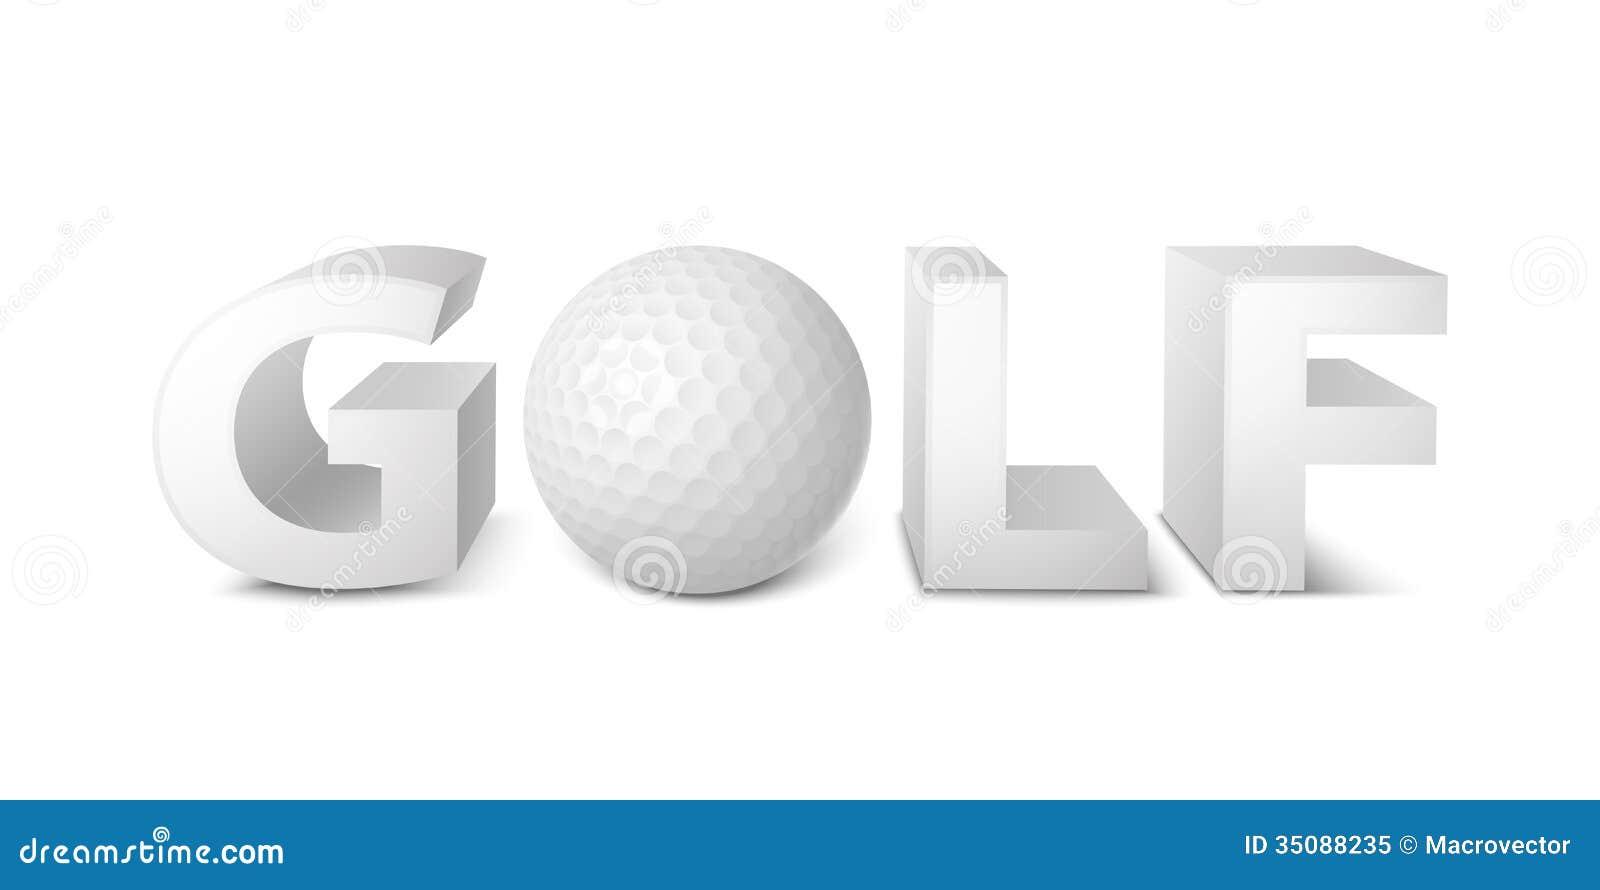 golf logo royalty free stock photo image 35088235